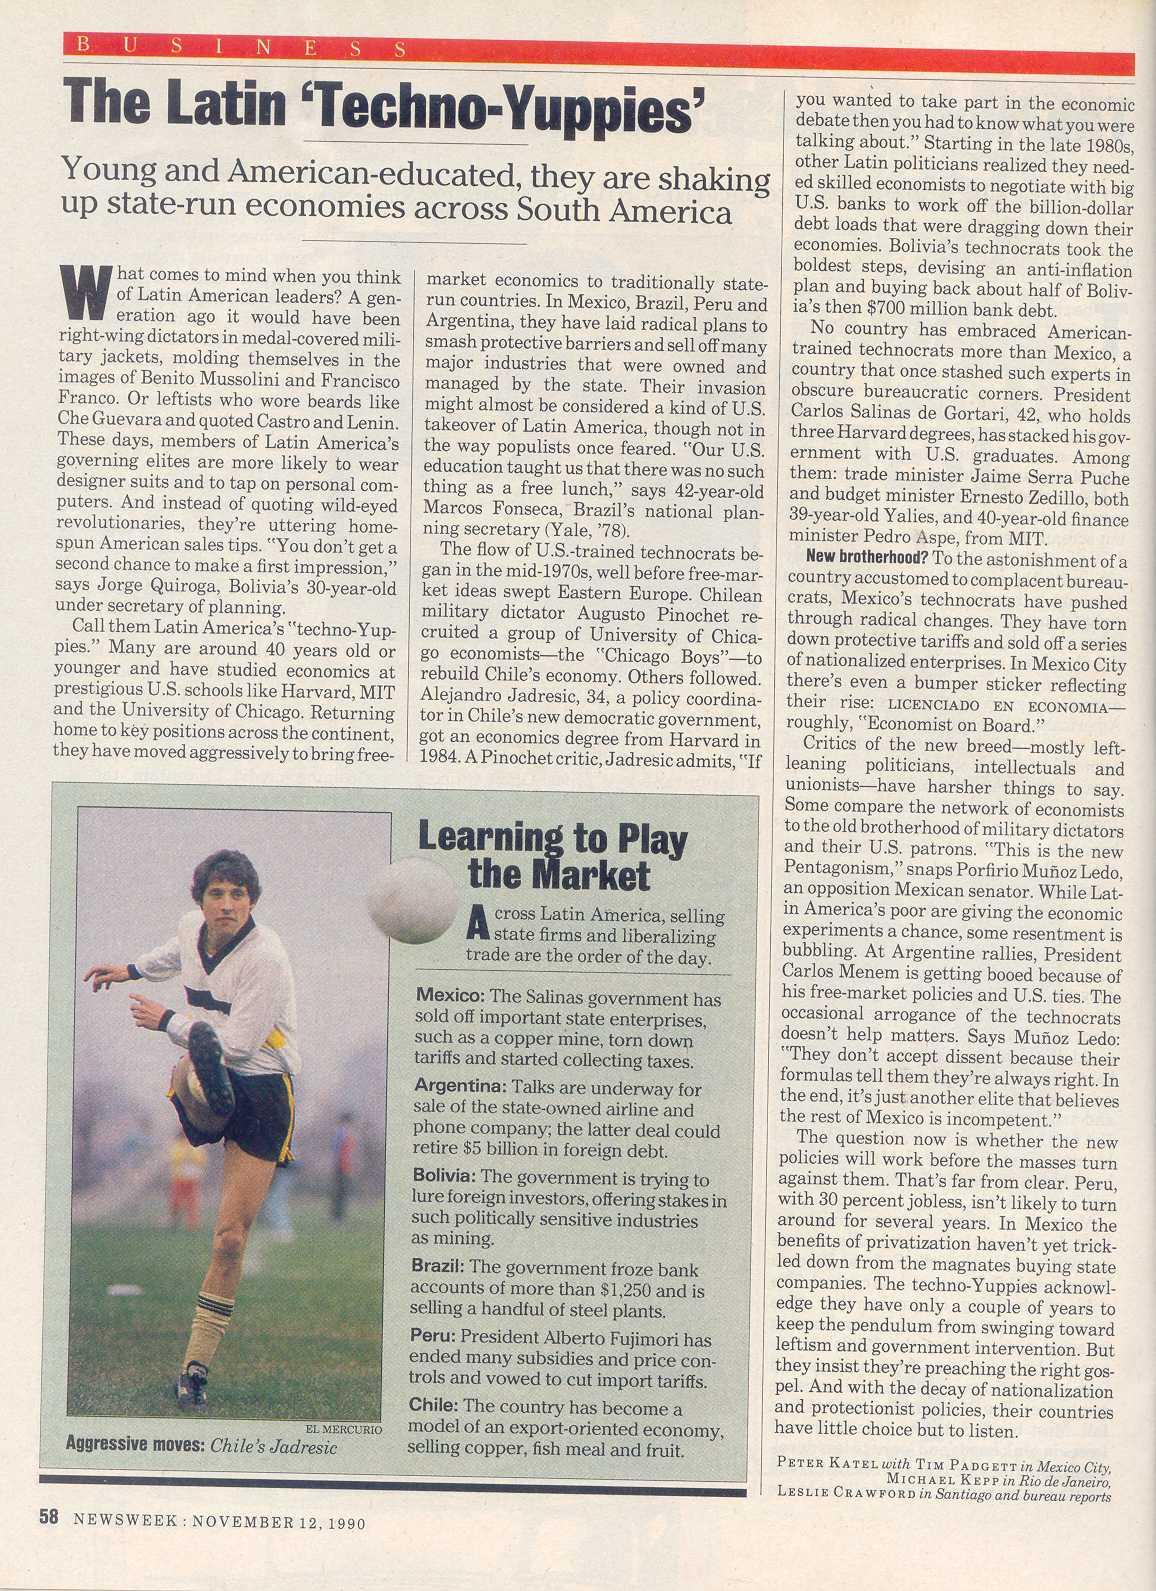 Peter Katel in Mexico City – NEWSWEEK Magazine (1990)